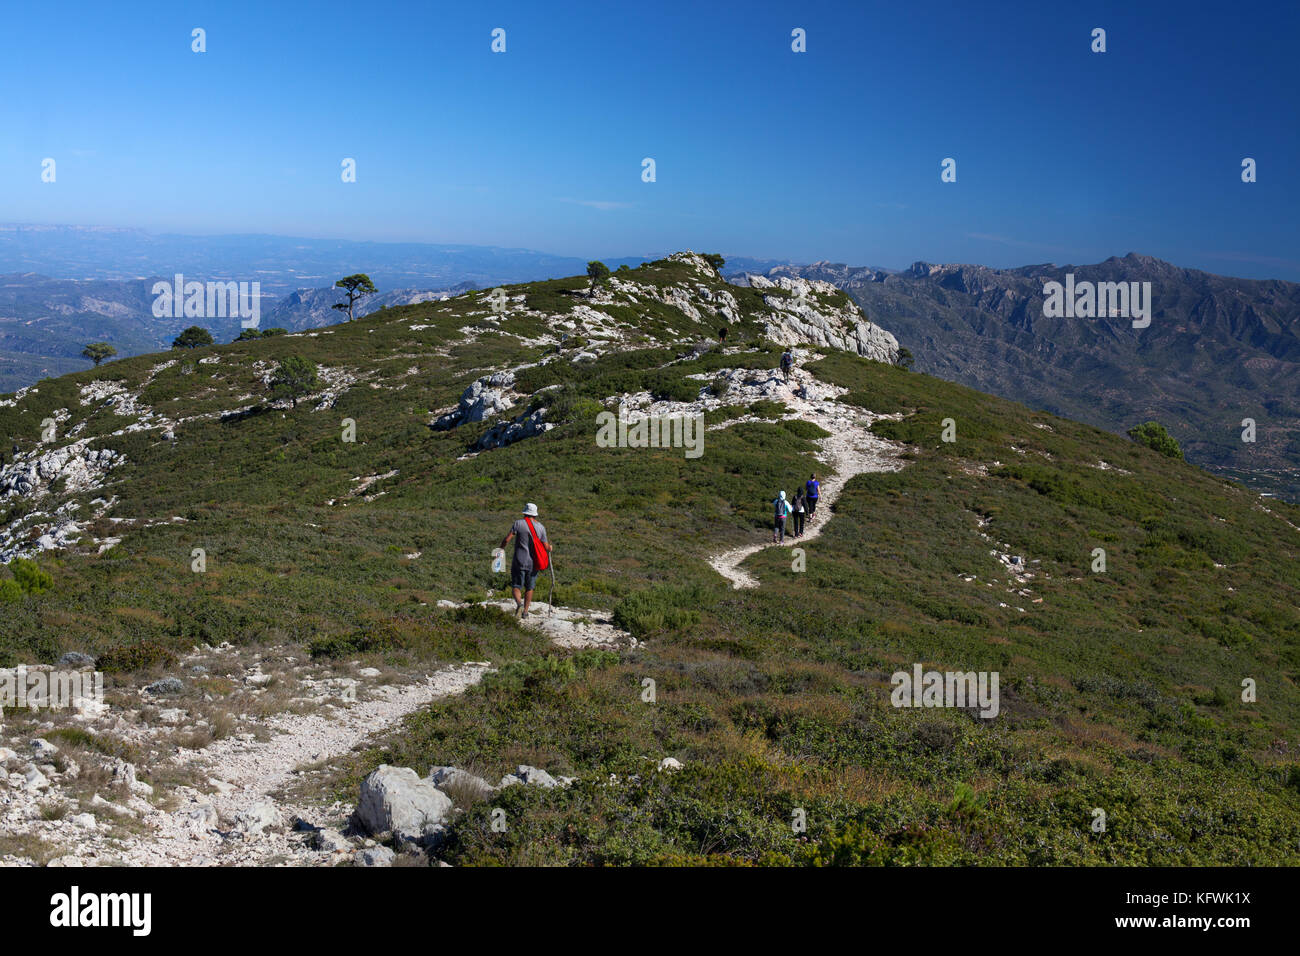 Hikers, el Molar, Tarragona, Spain. - Stock Image